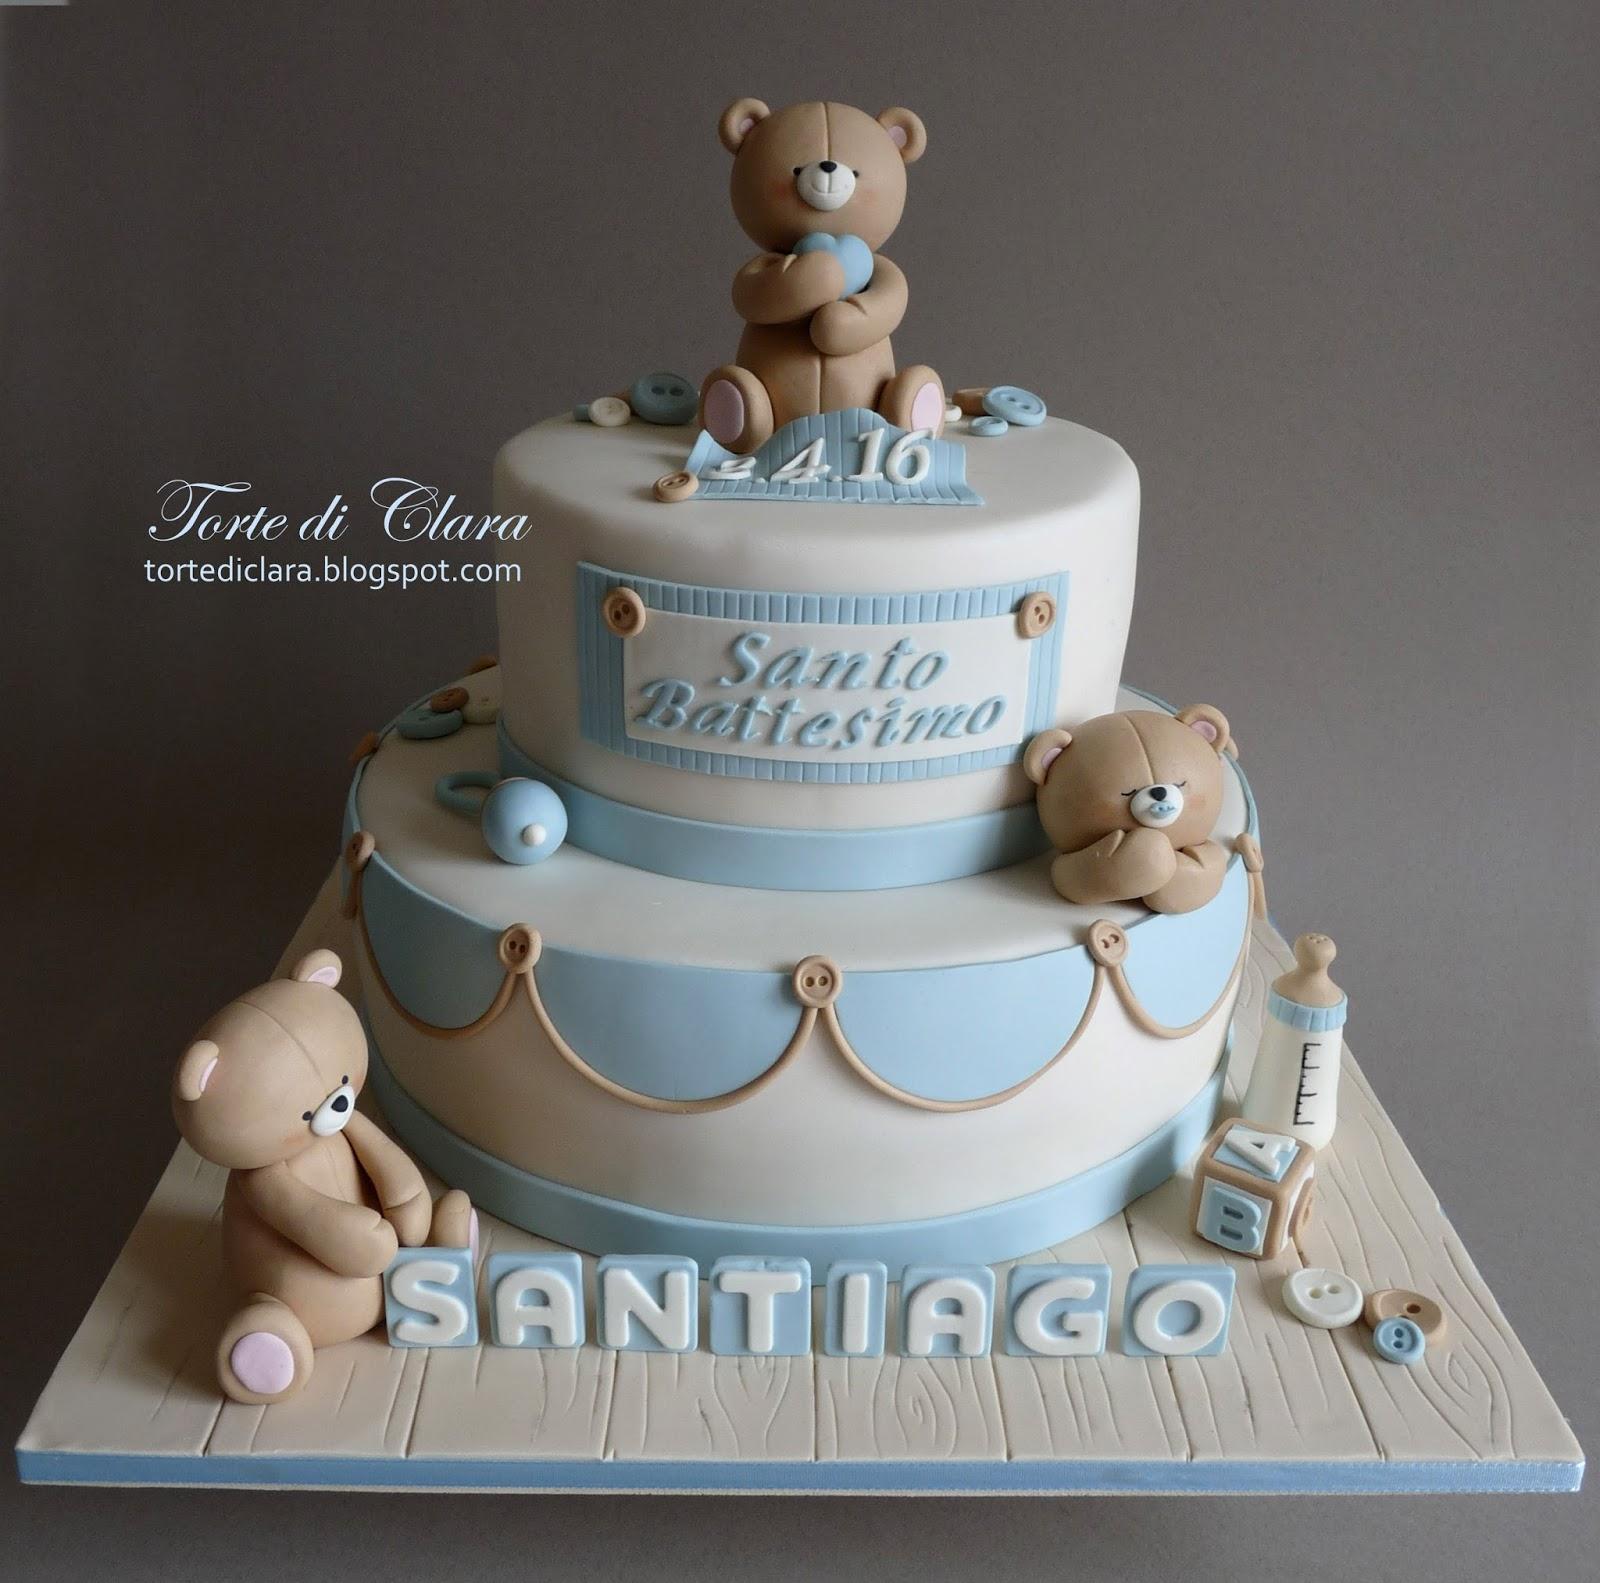 Bien-aimé Torte di Clara: Torta Battesimo (18) ZR95